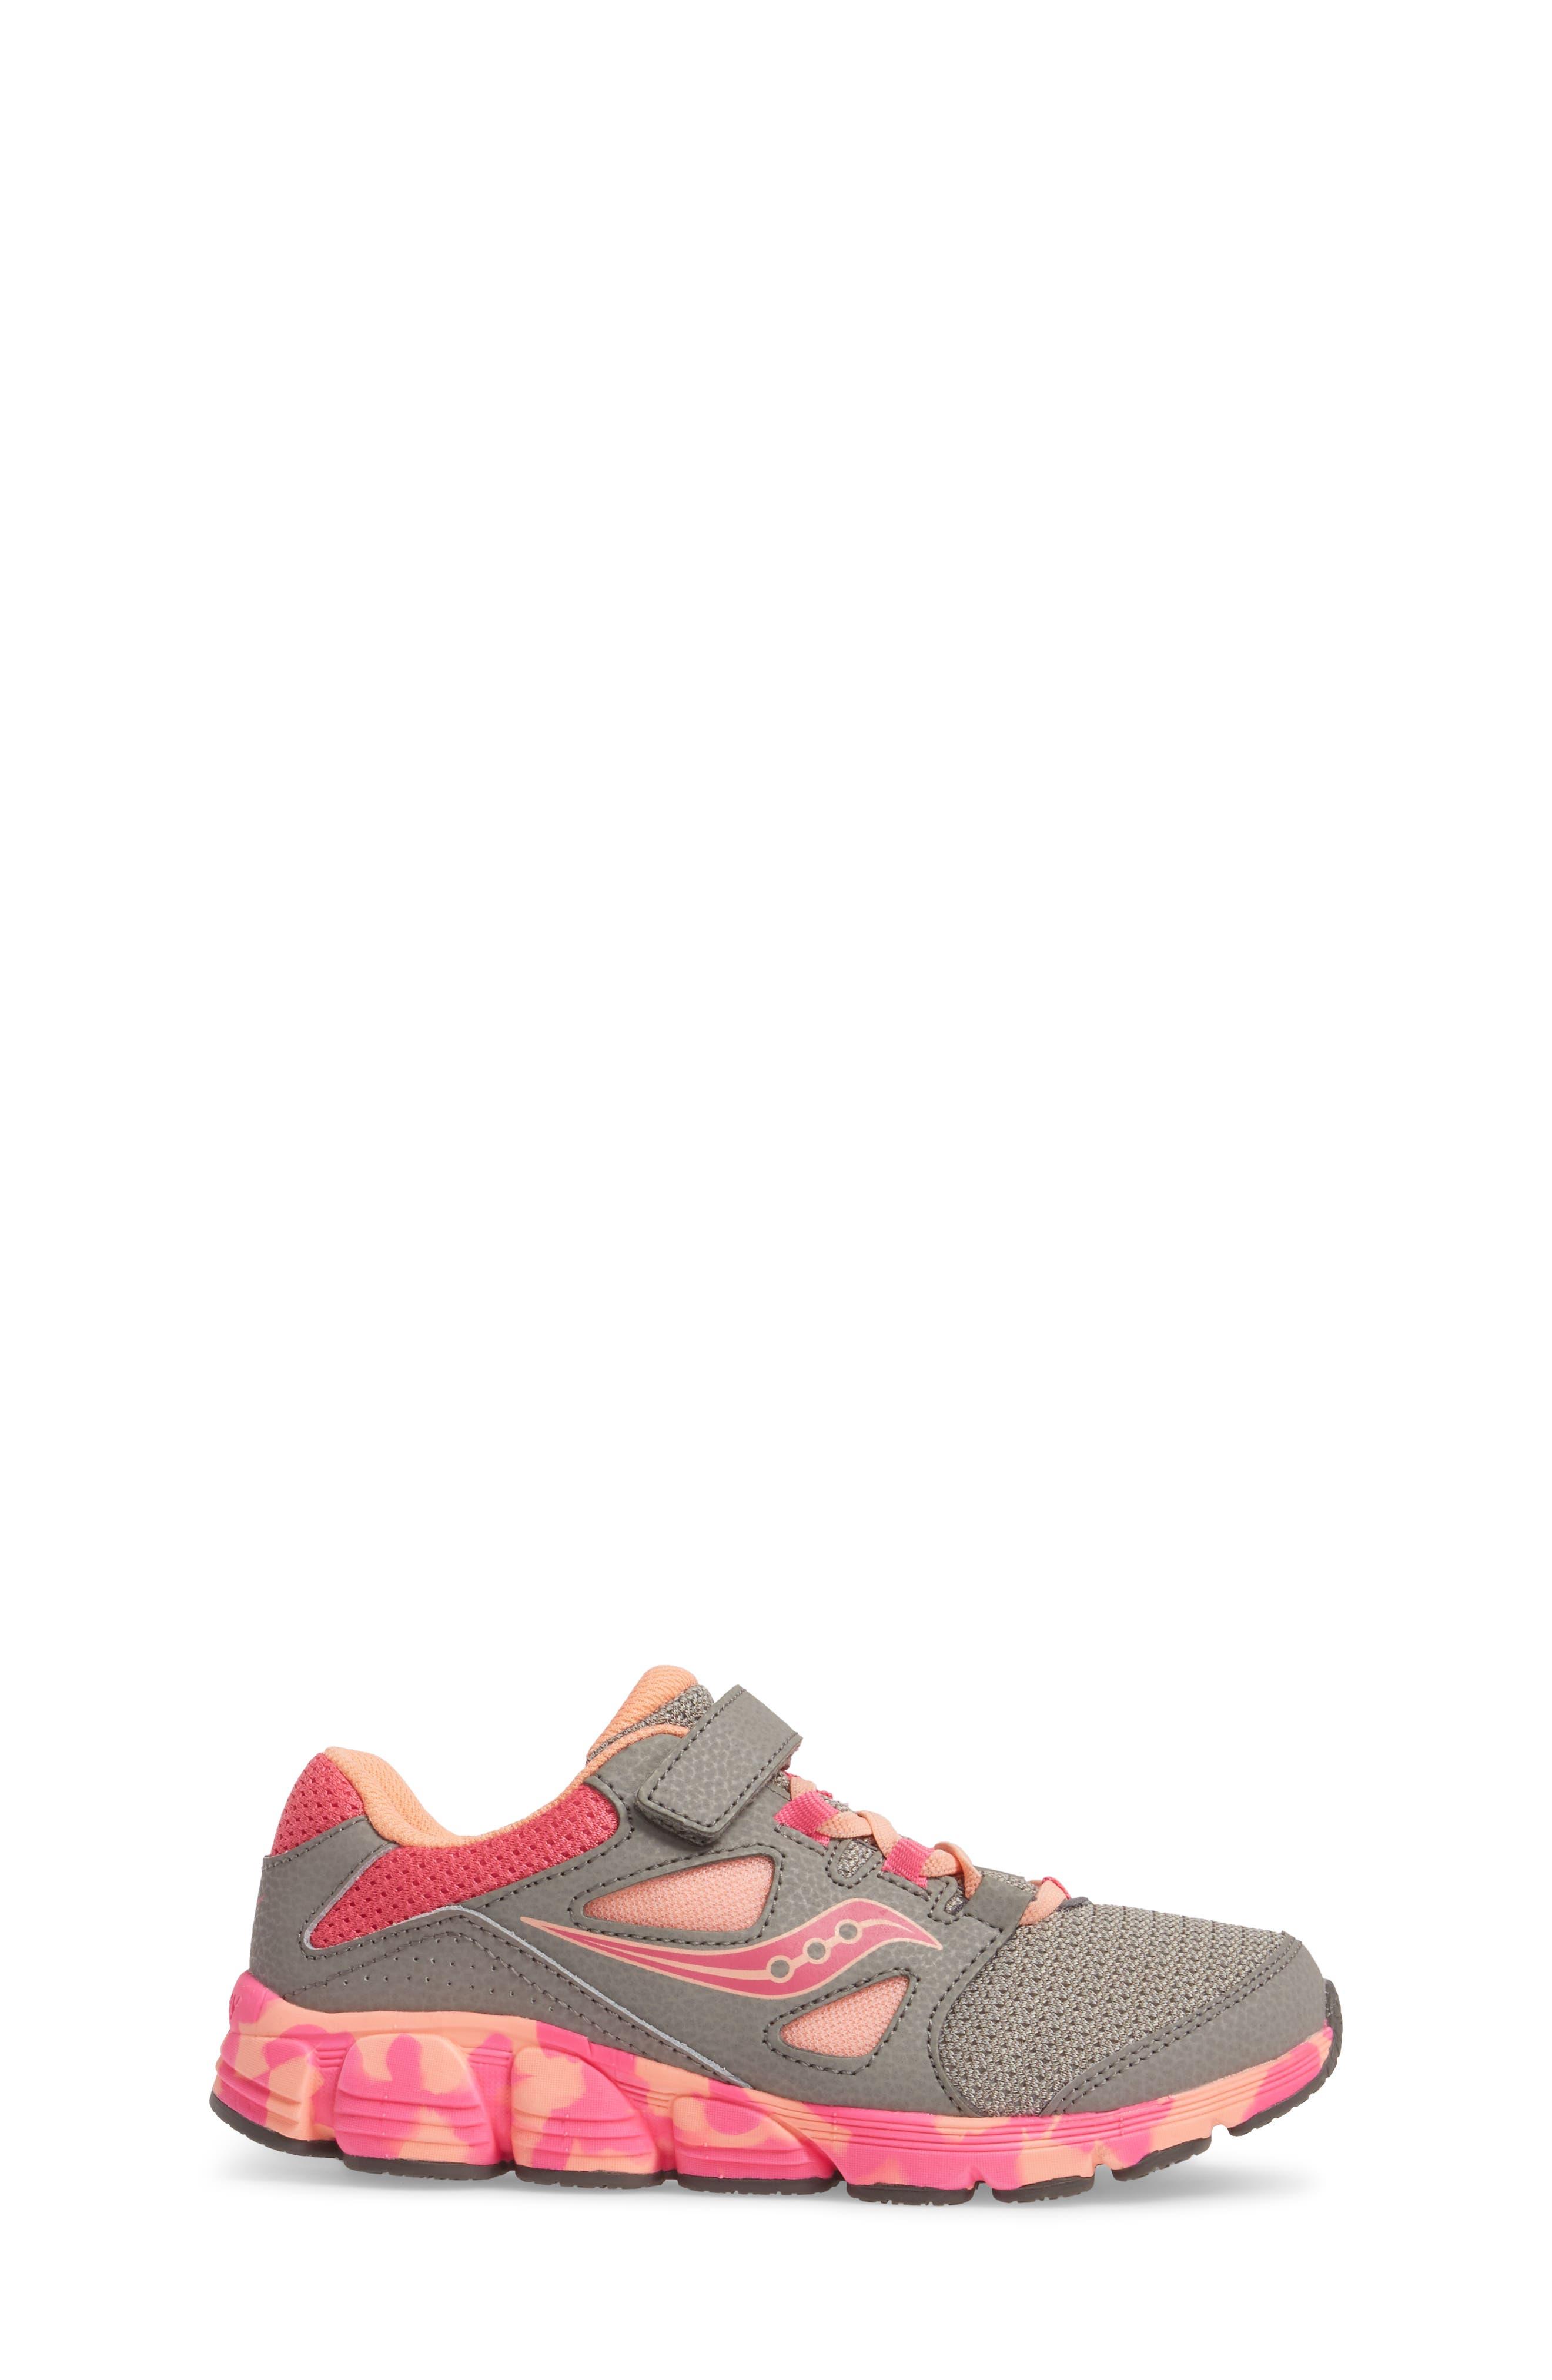 Kotaro 4 Sneaker,                             Alternate thumbnail 3, color,                             020